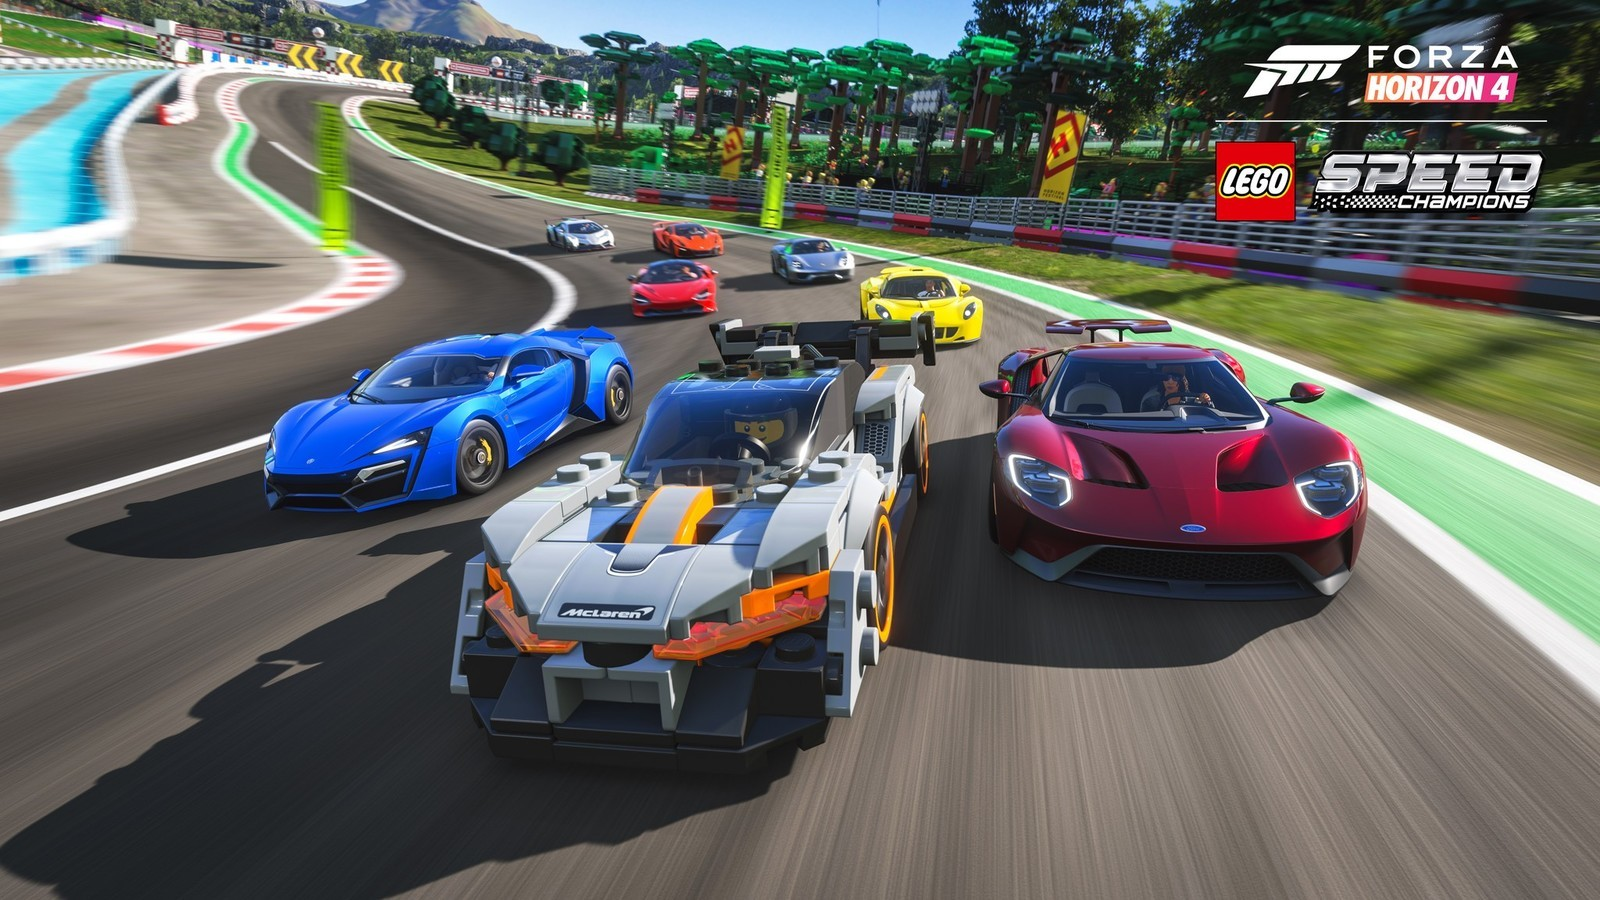 خرید سی دی کی Forza Horizon 4 اسکرین شات 1